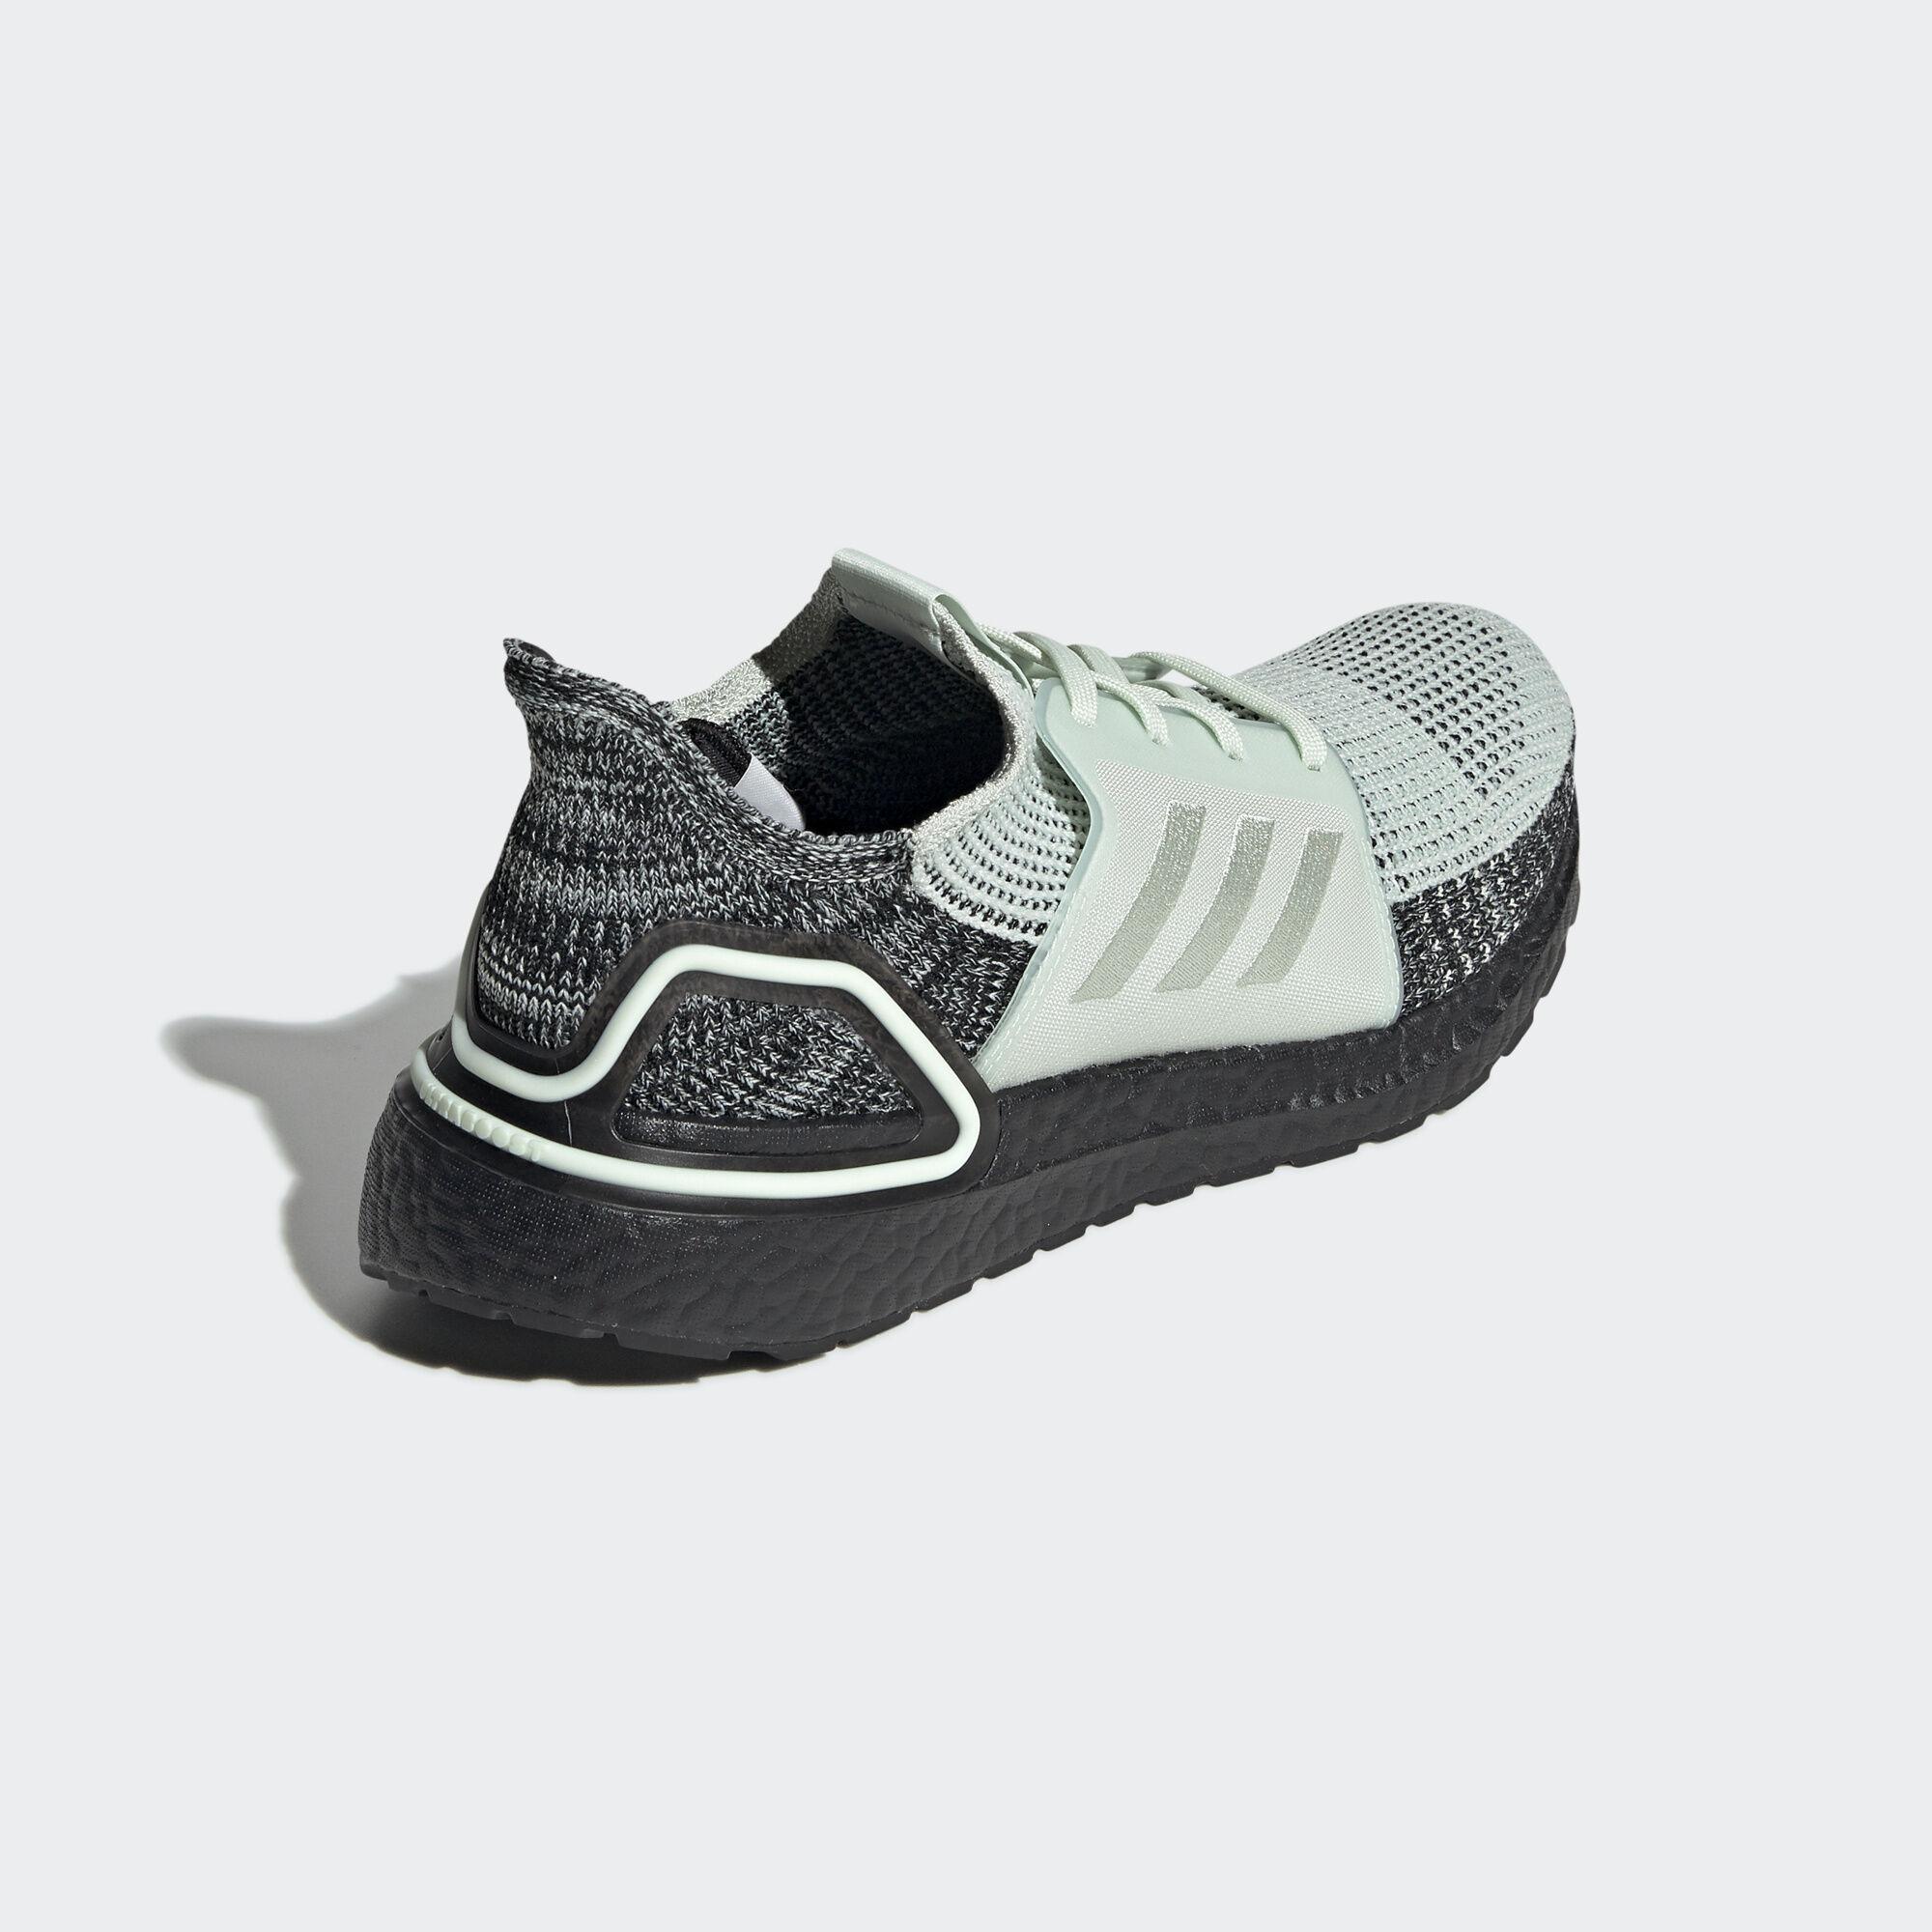 Adidas UltraBoost F34075